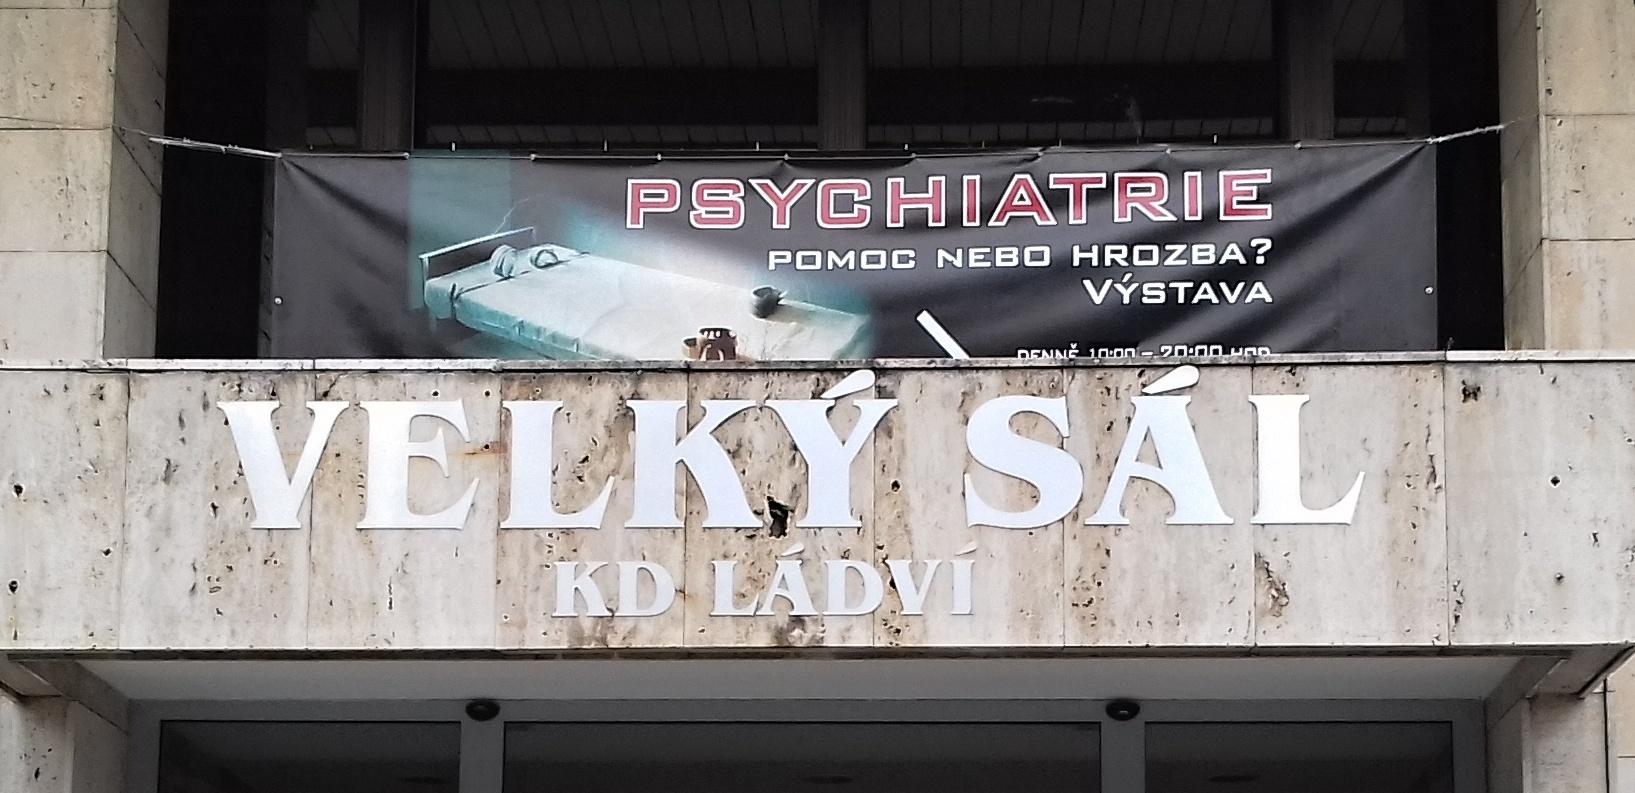 Scientologie versus psychiatrie